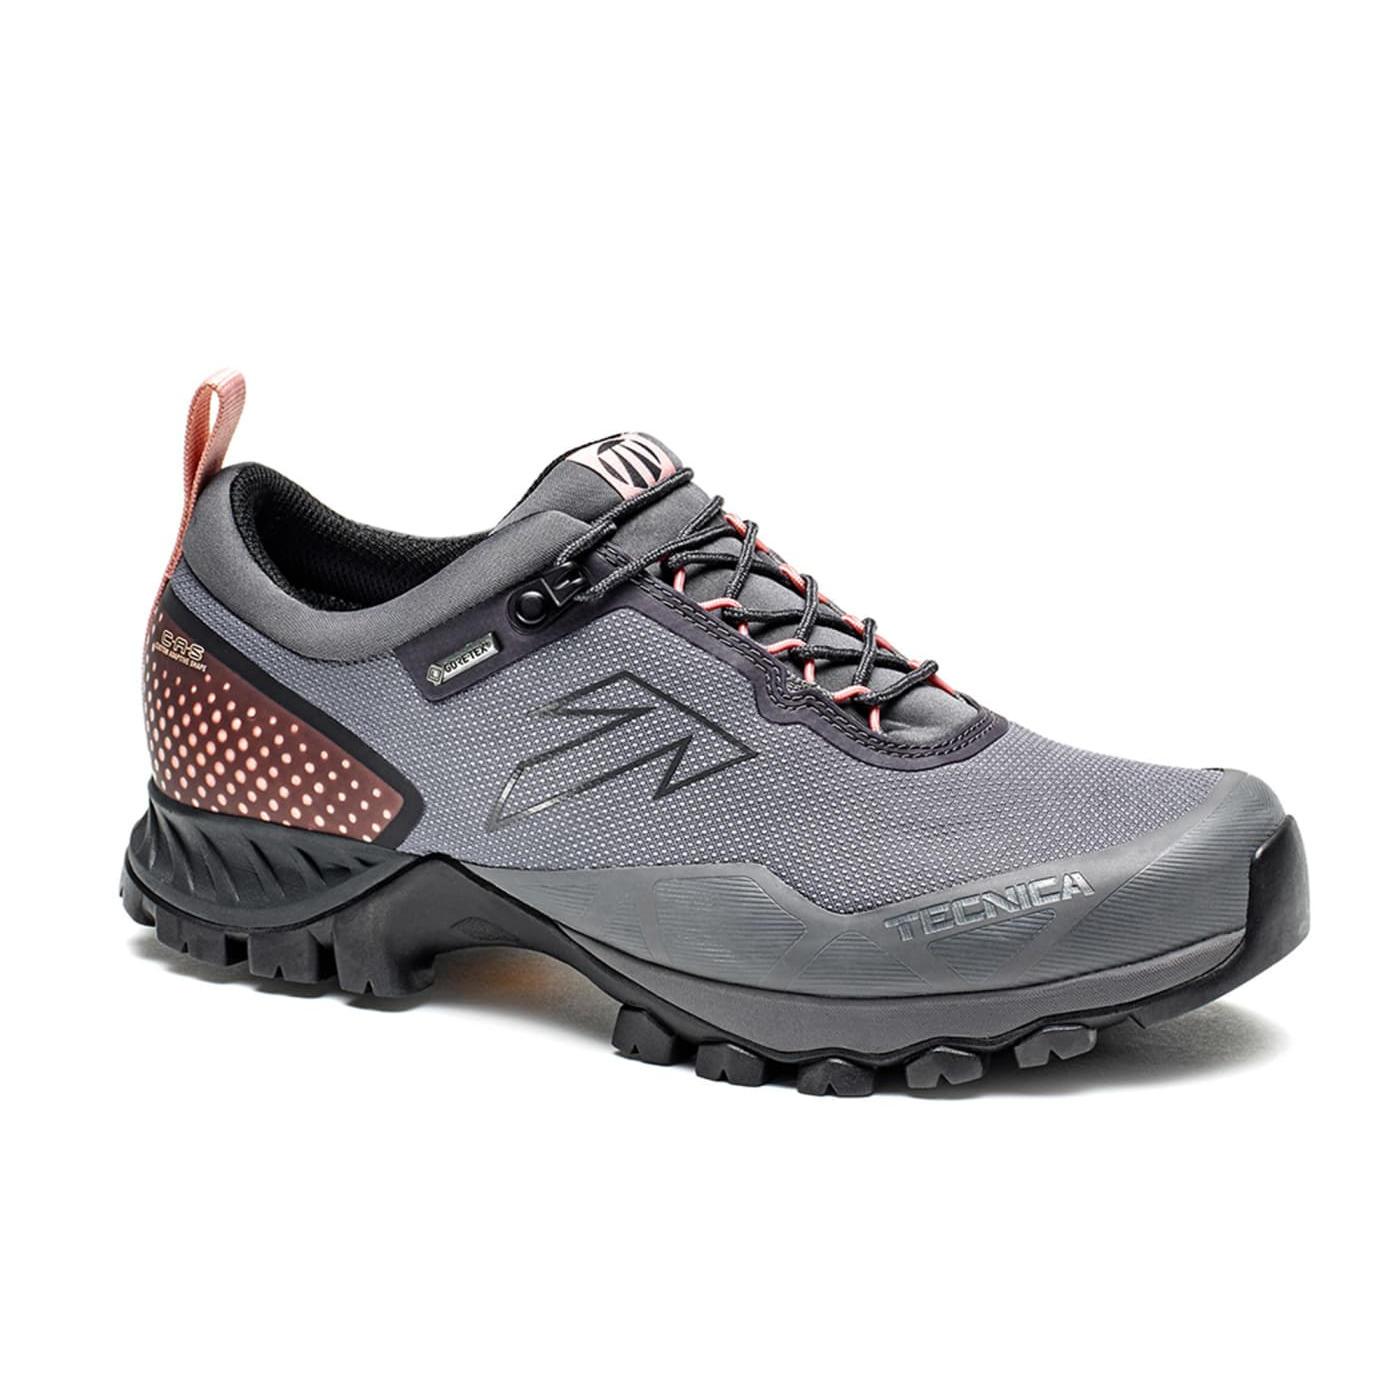 Plasma S GTX Shoe Midway Piedra - Women's